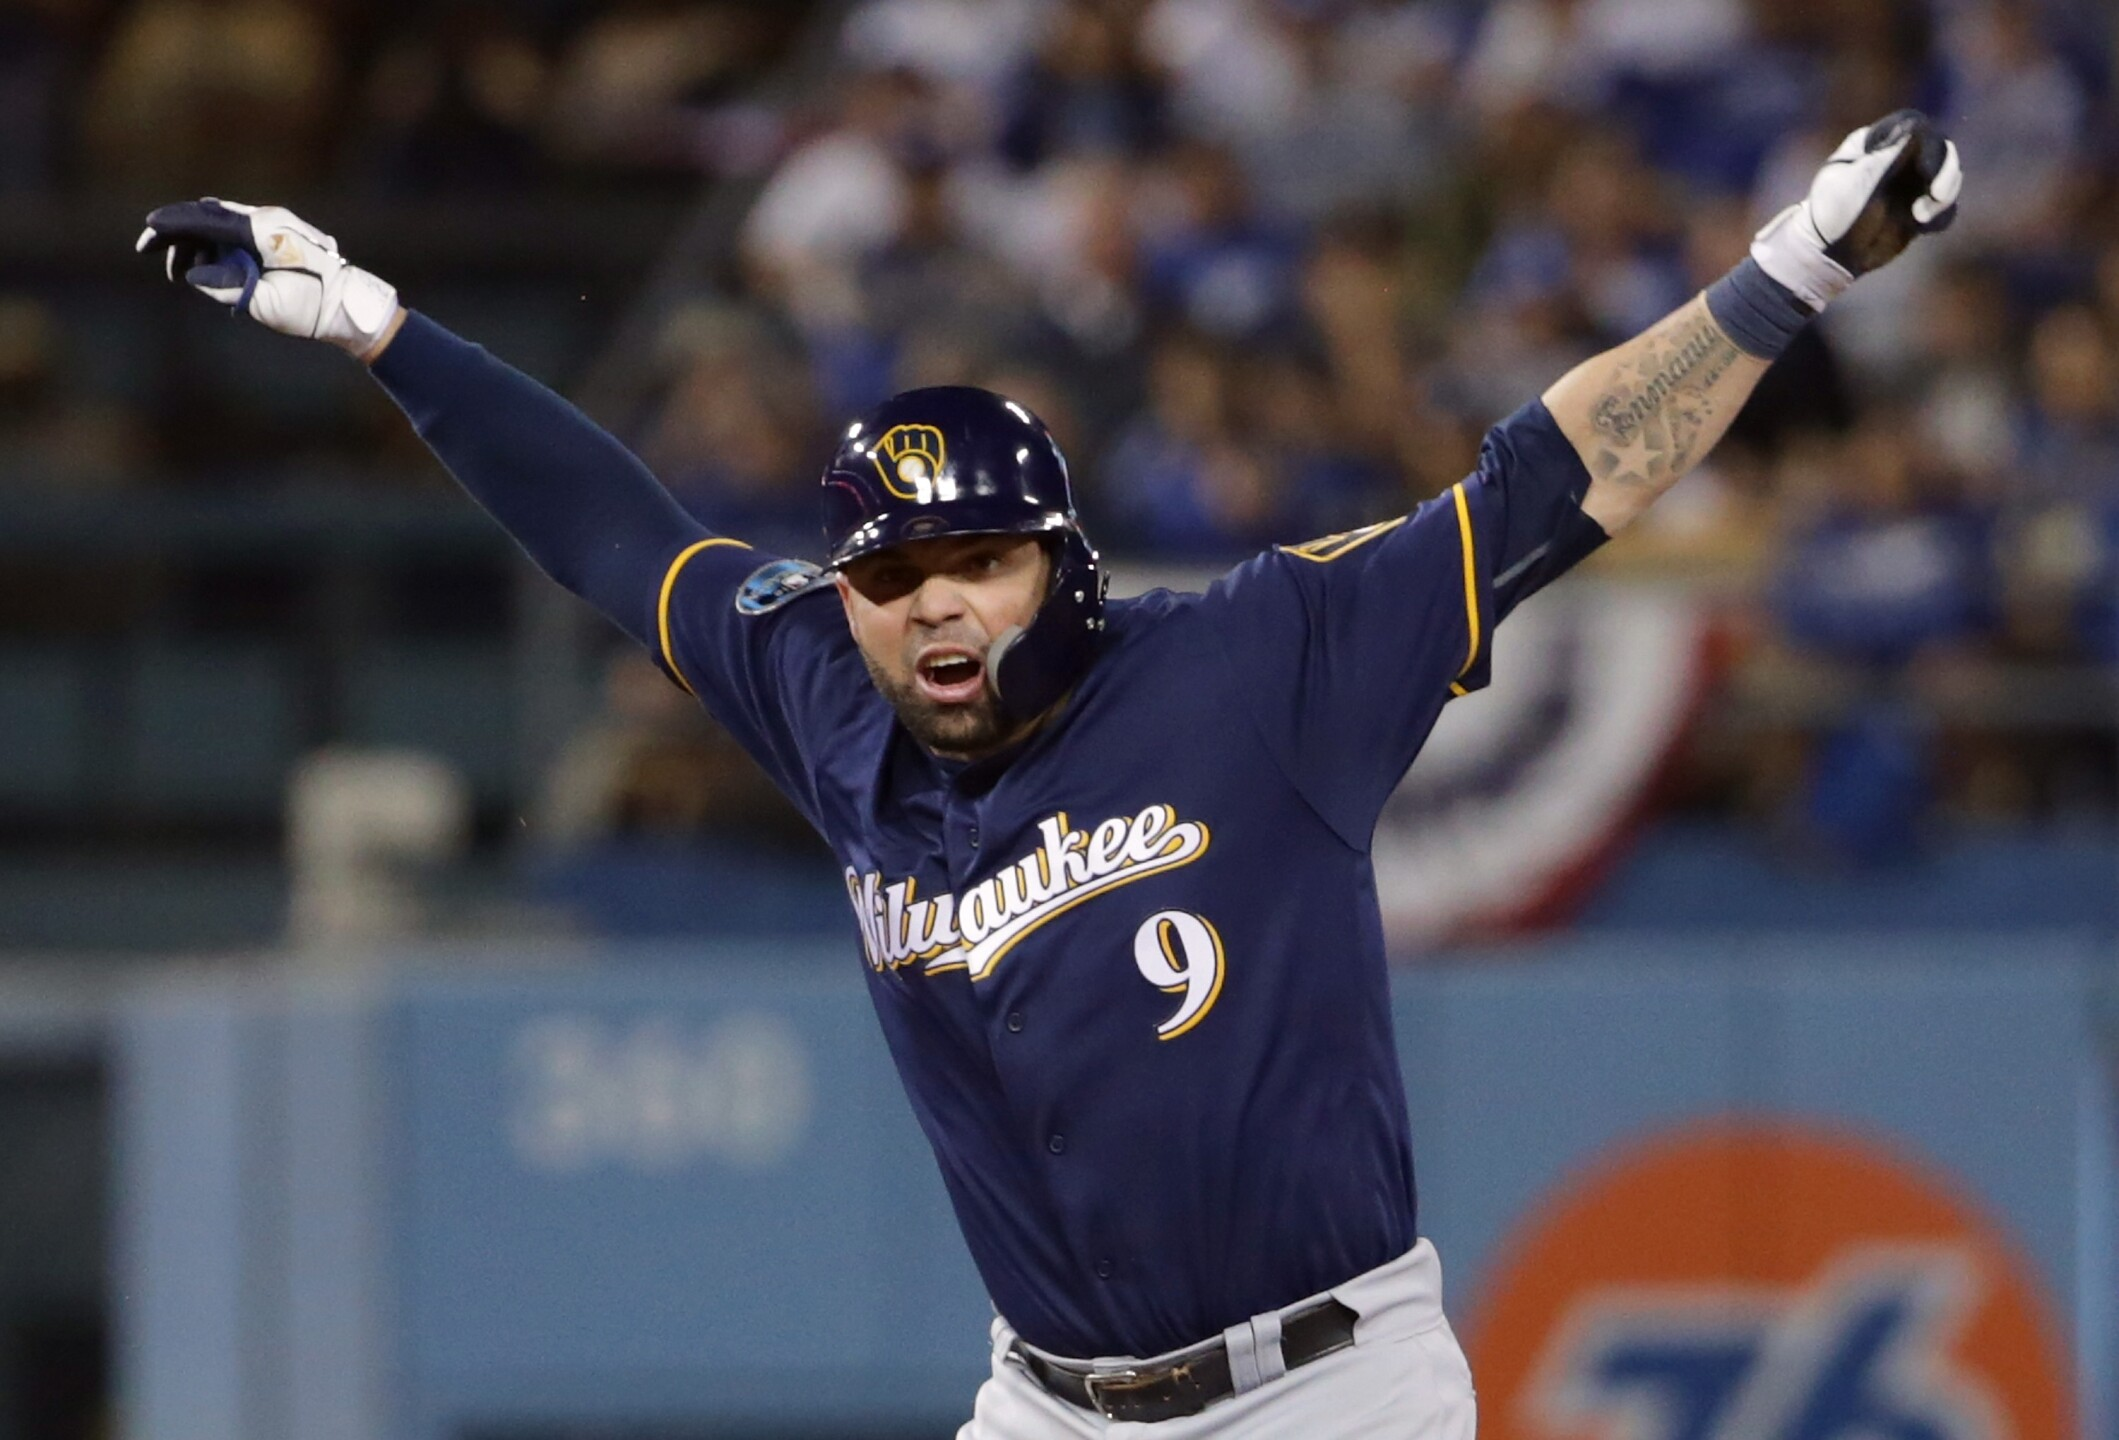 Catcher Manny Pina